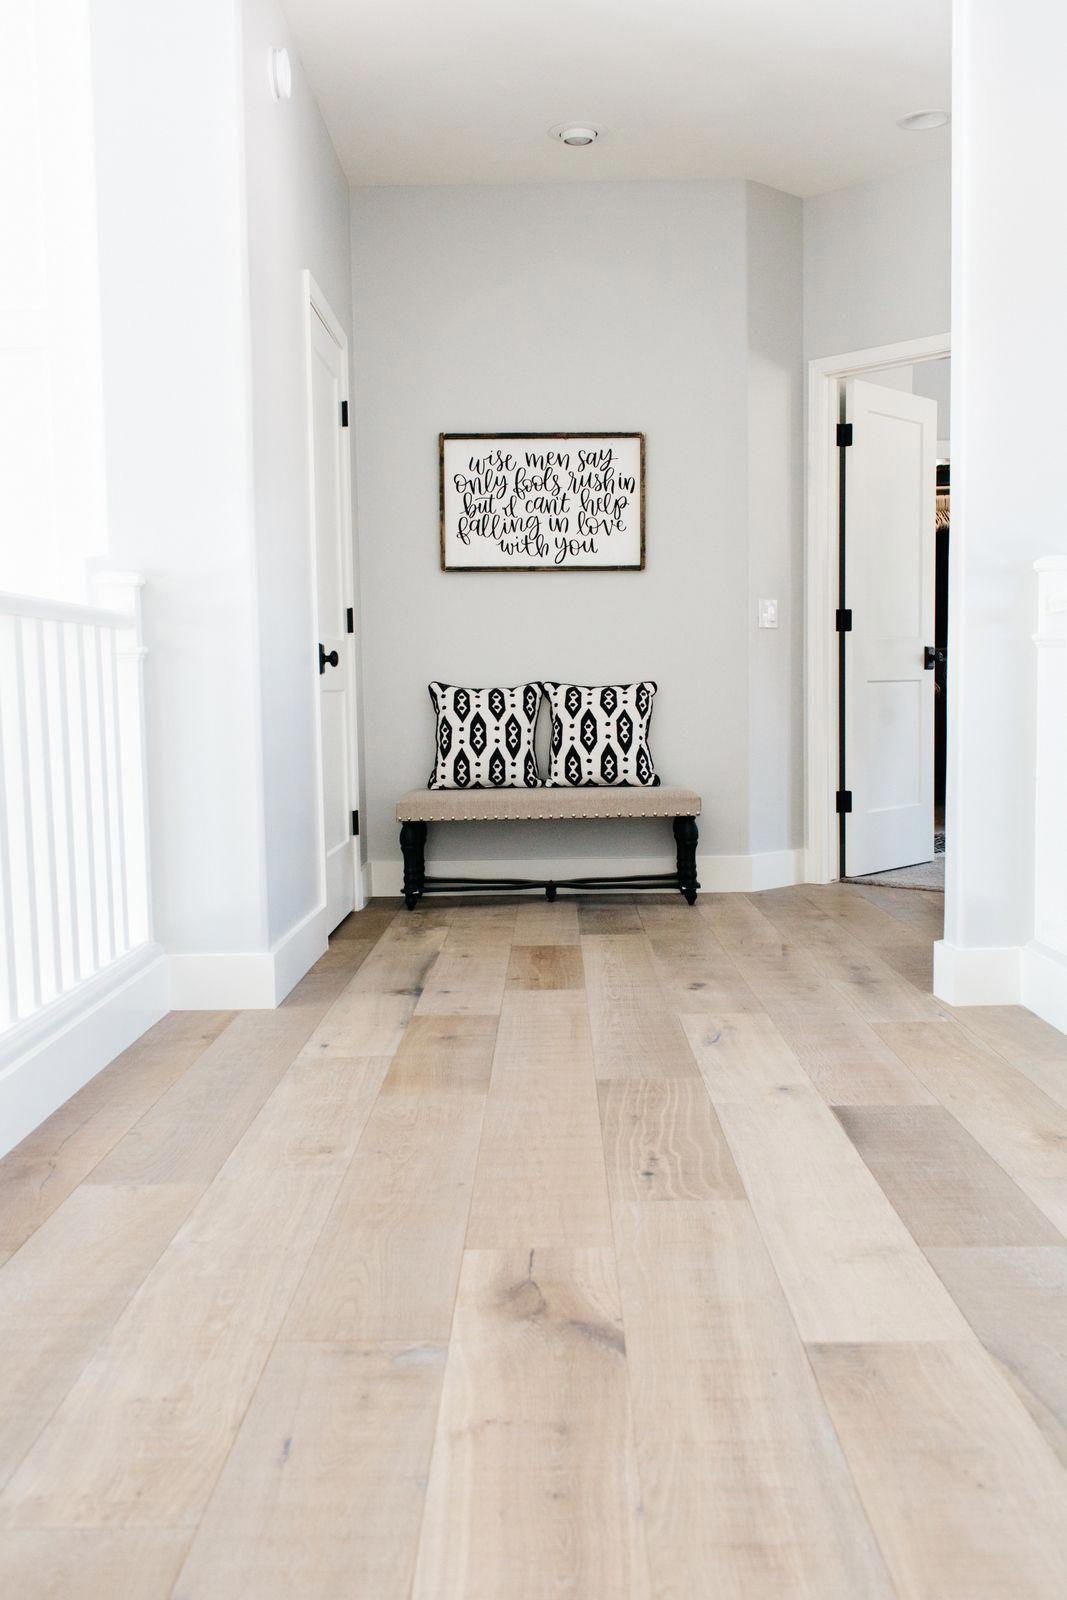 Montpelier Oak Wood Flooring Sold At Floor Decor Nice Blend Of Grey And Browns Flooringideaswood Home Remodeling Wood Floor Colors House Flooring